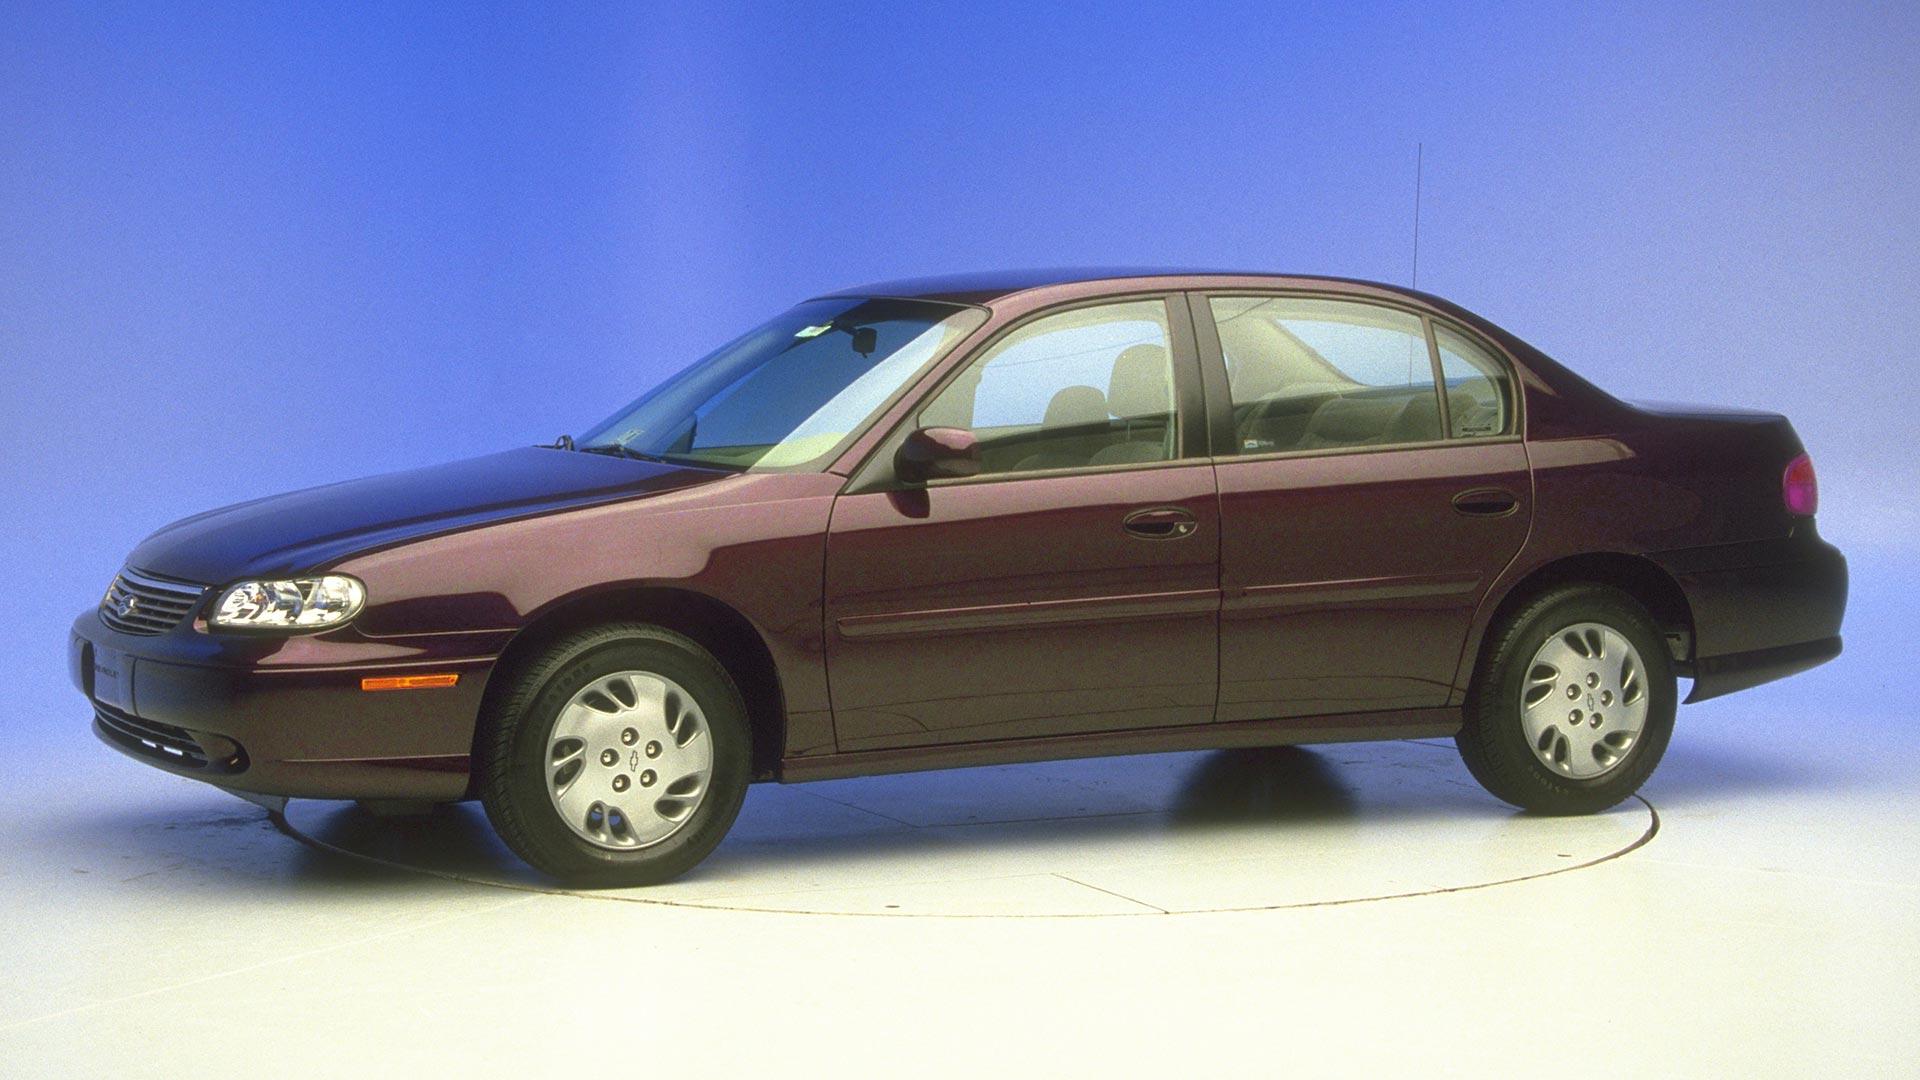 hight resolution of 2000 chevrolet malibu classic 4 door sedan